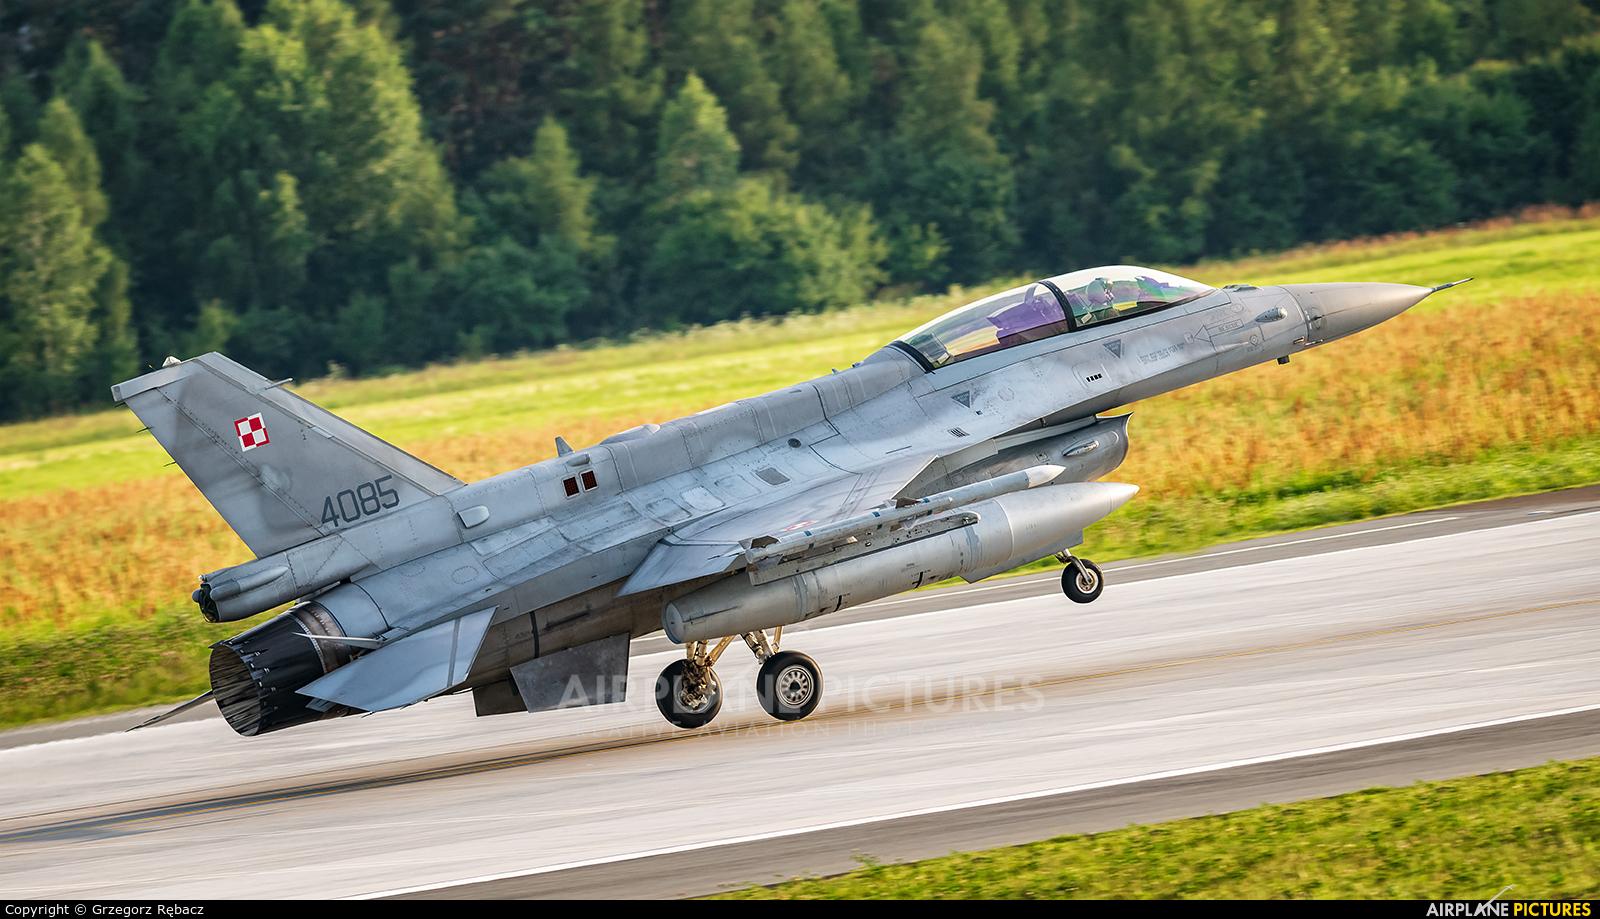 Poland - Air Force 4085 aircraft at Łask AB